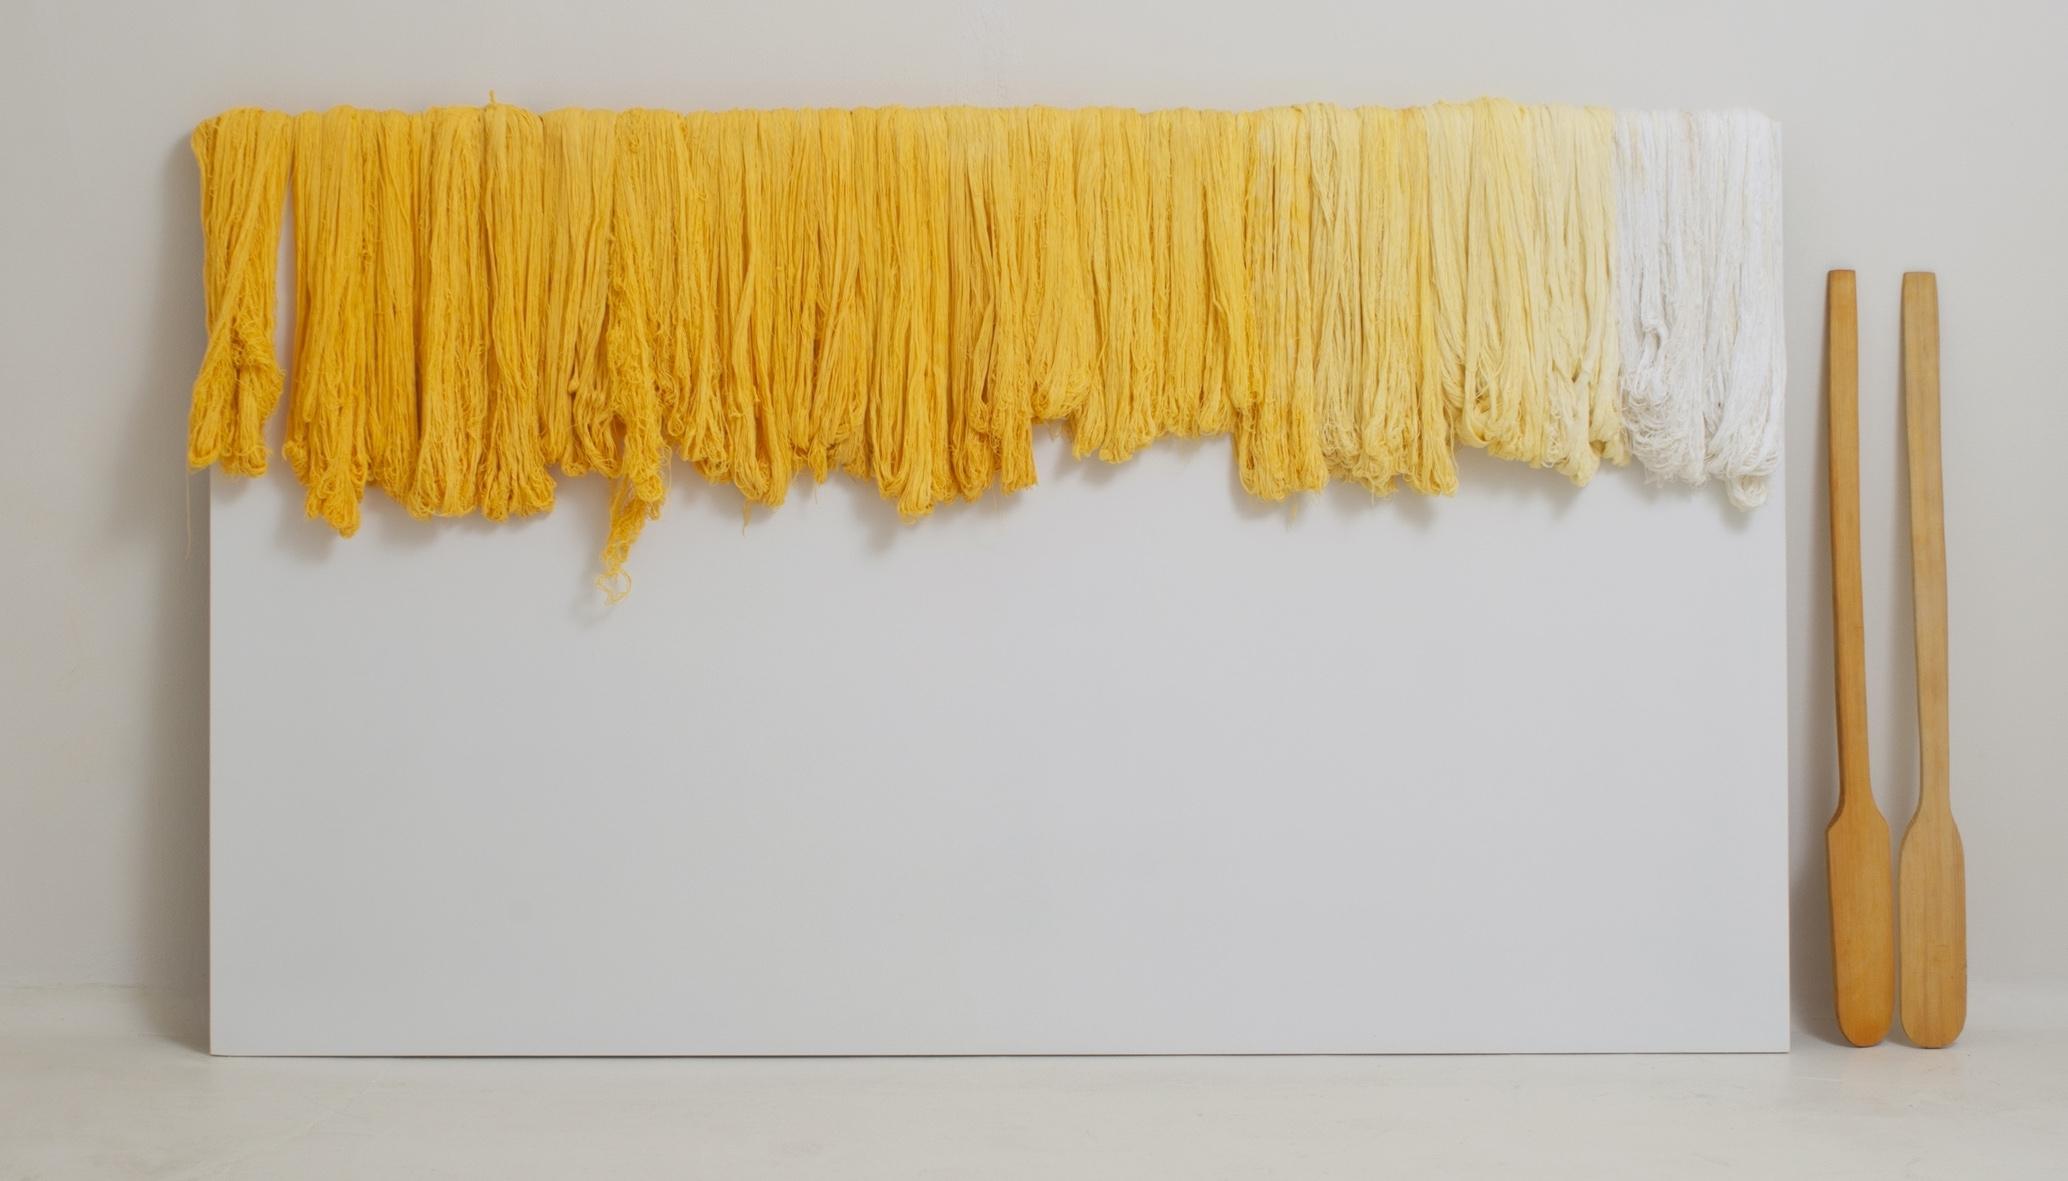 Sandra Monterroso, Expoliada (2011).Thread and wood.